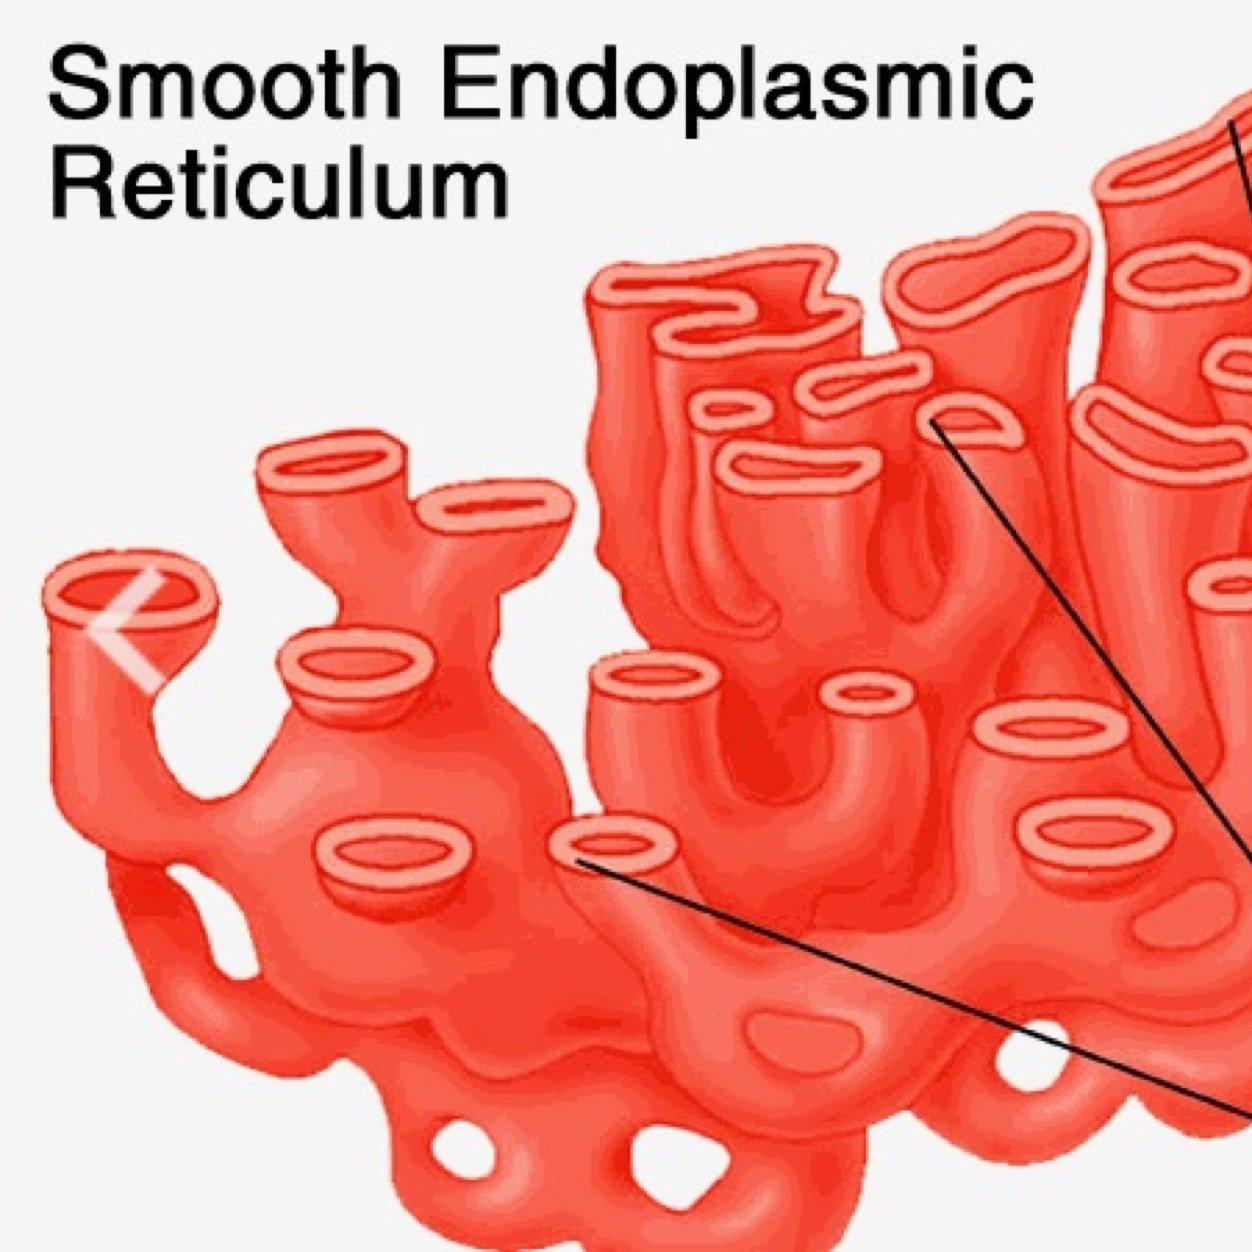 Animal Cell Endoplasmic Reticulum | Hot Girl HD Wallpaper